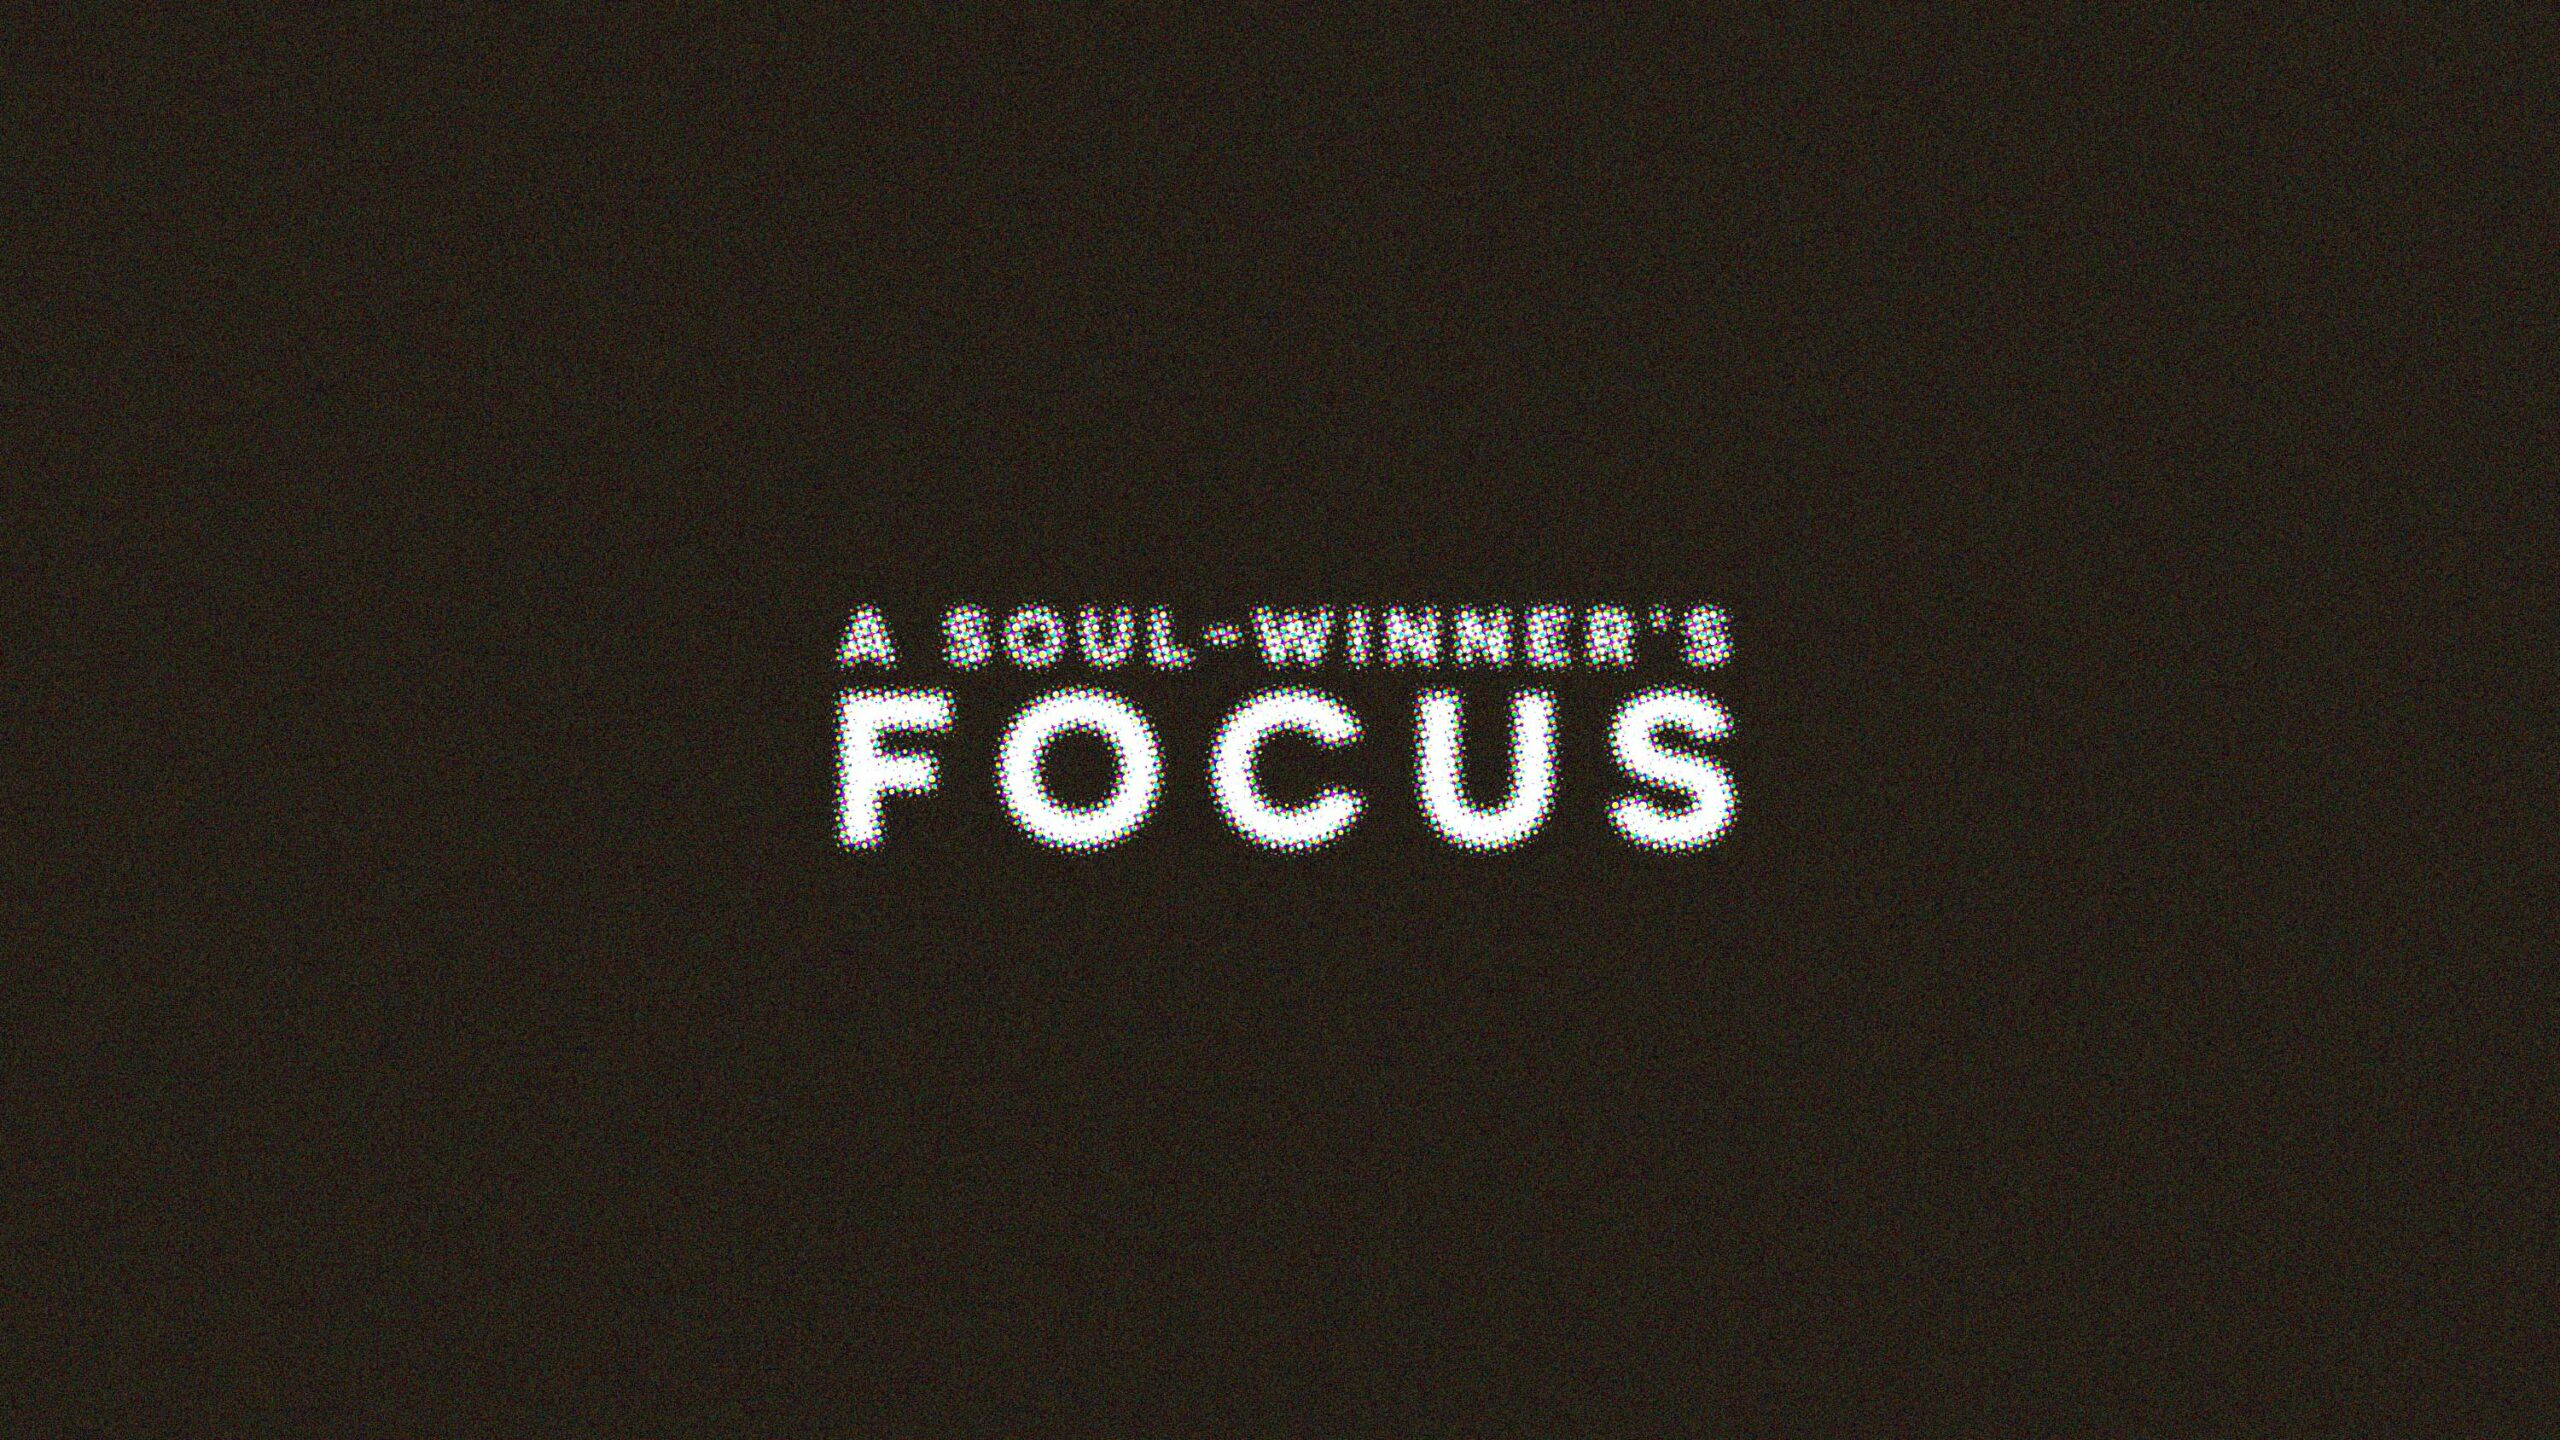 A Soul Winner's Focus